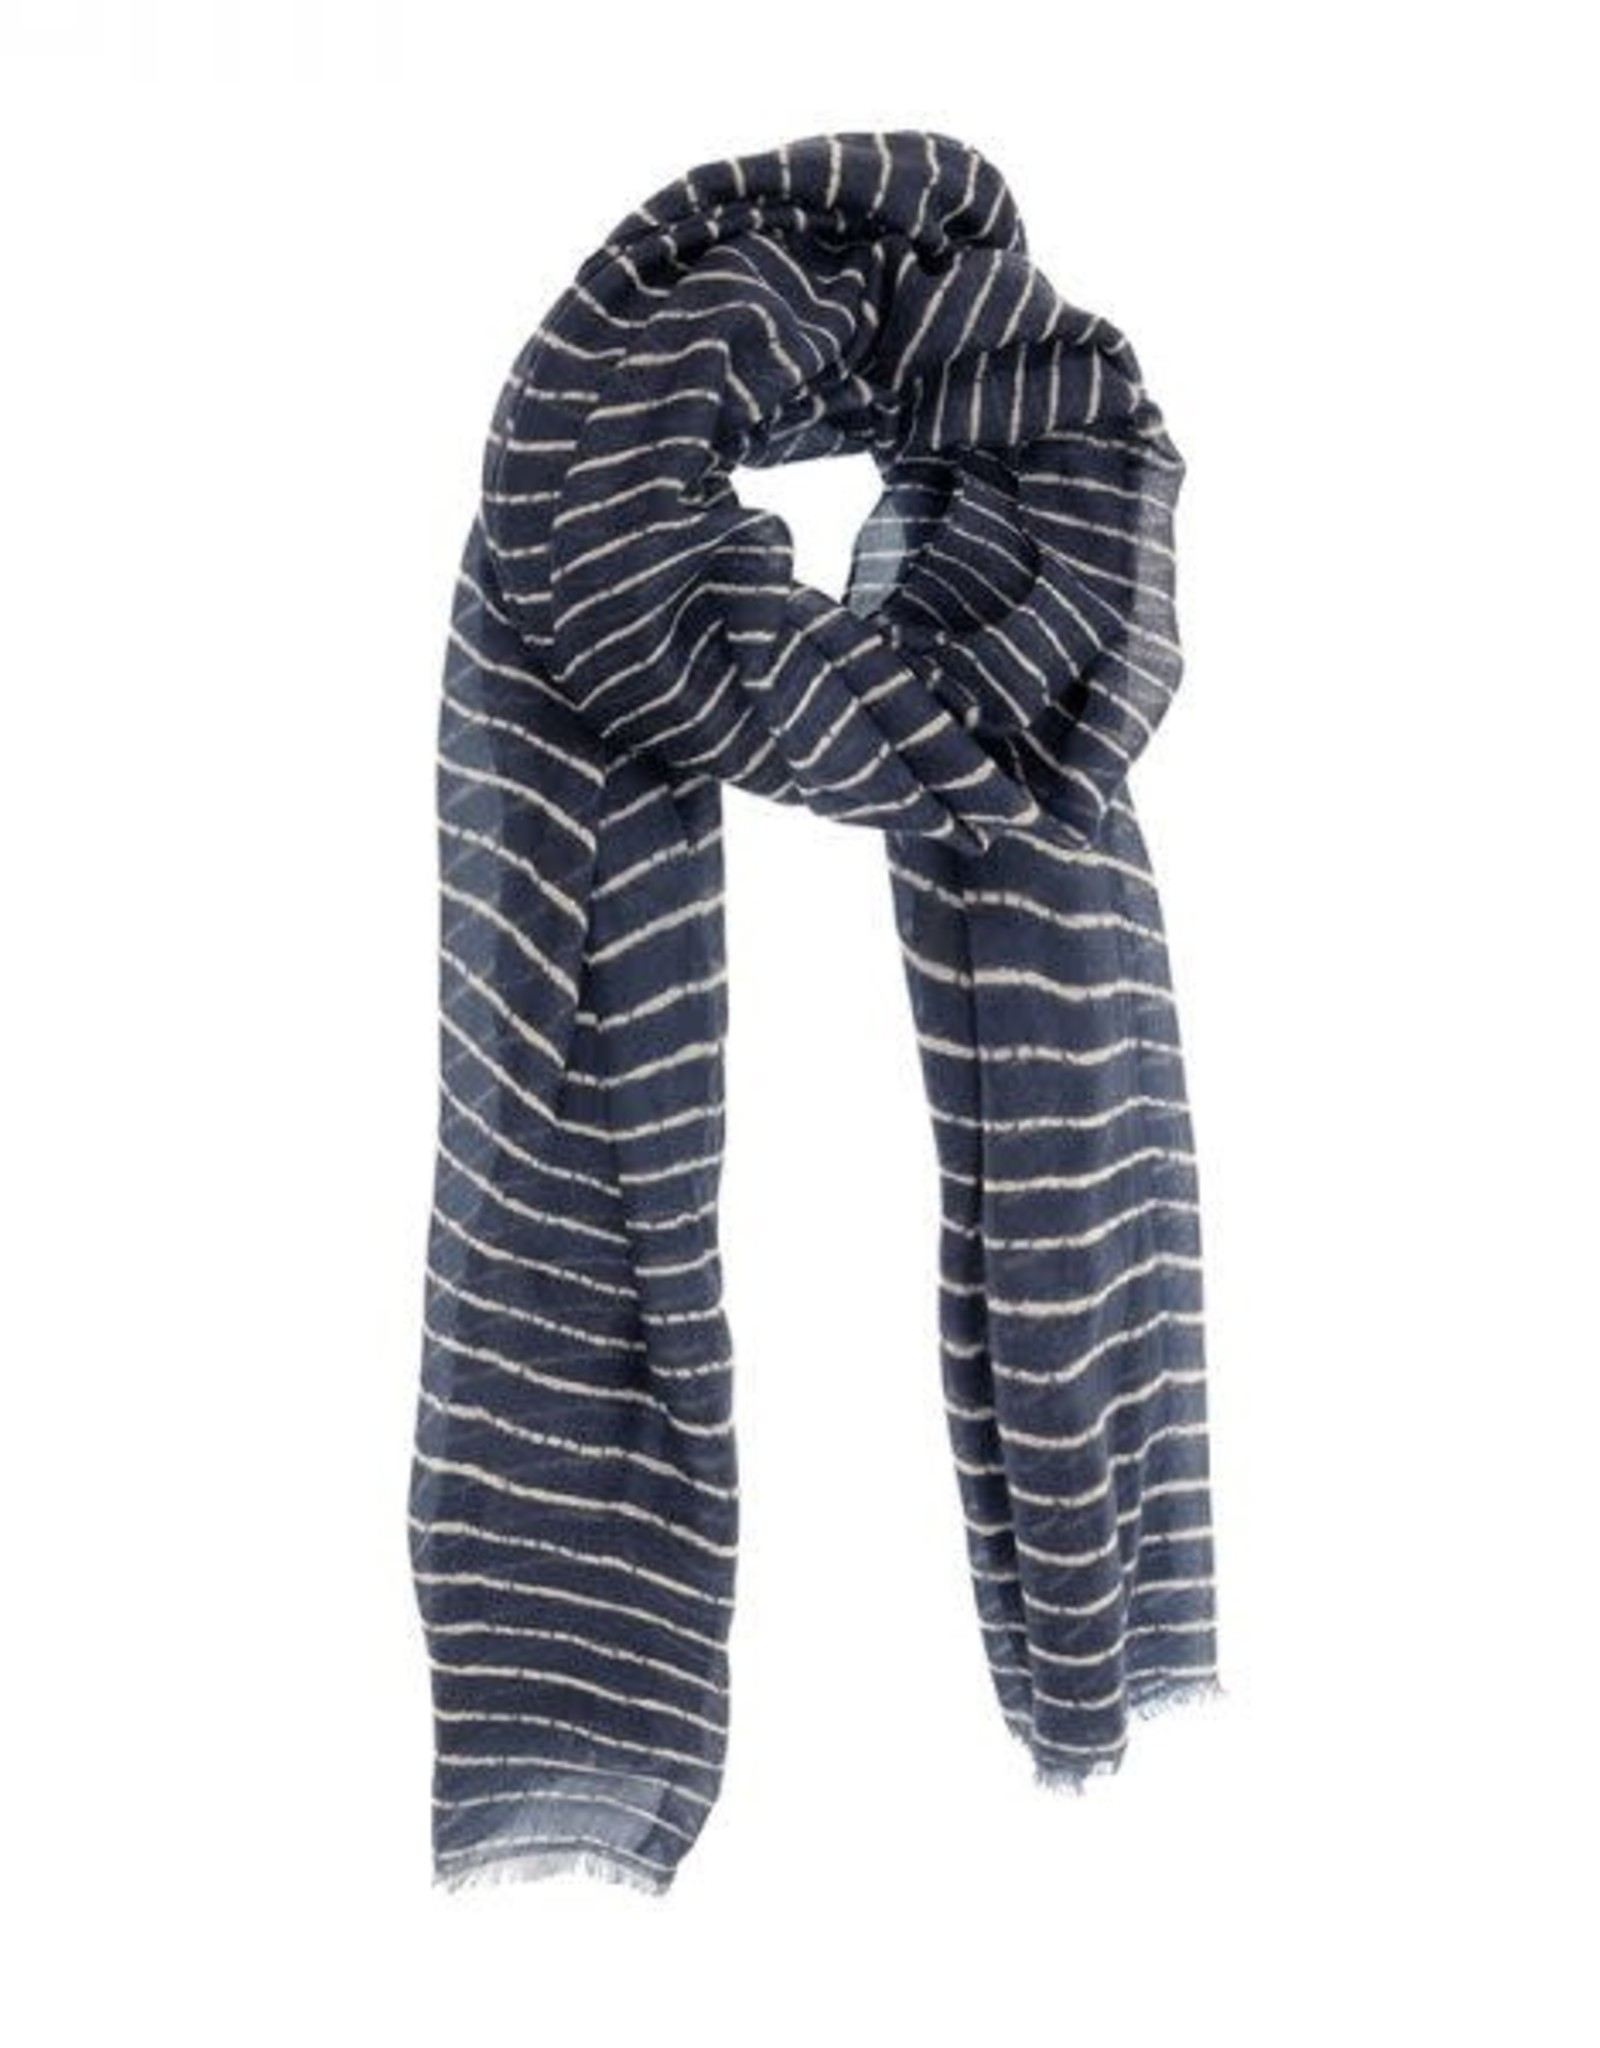 Joy Susan Accessories Broken Stripe Scarf